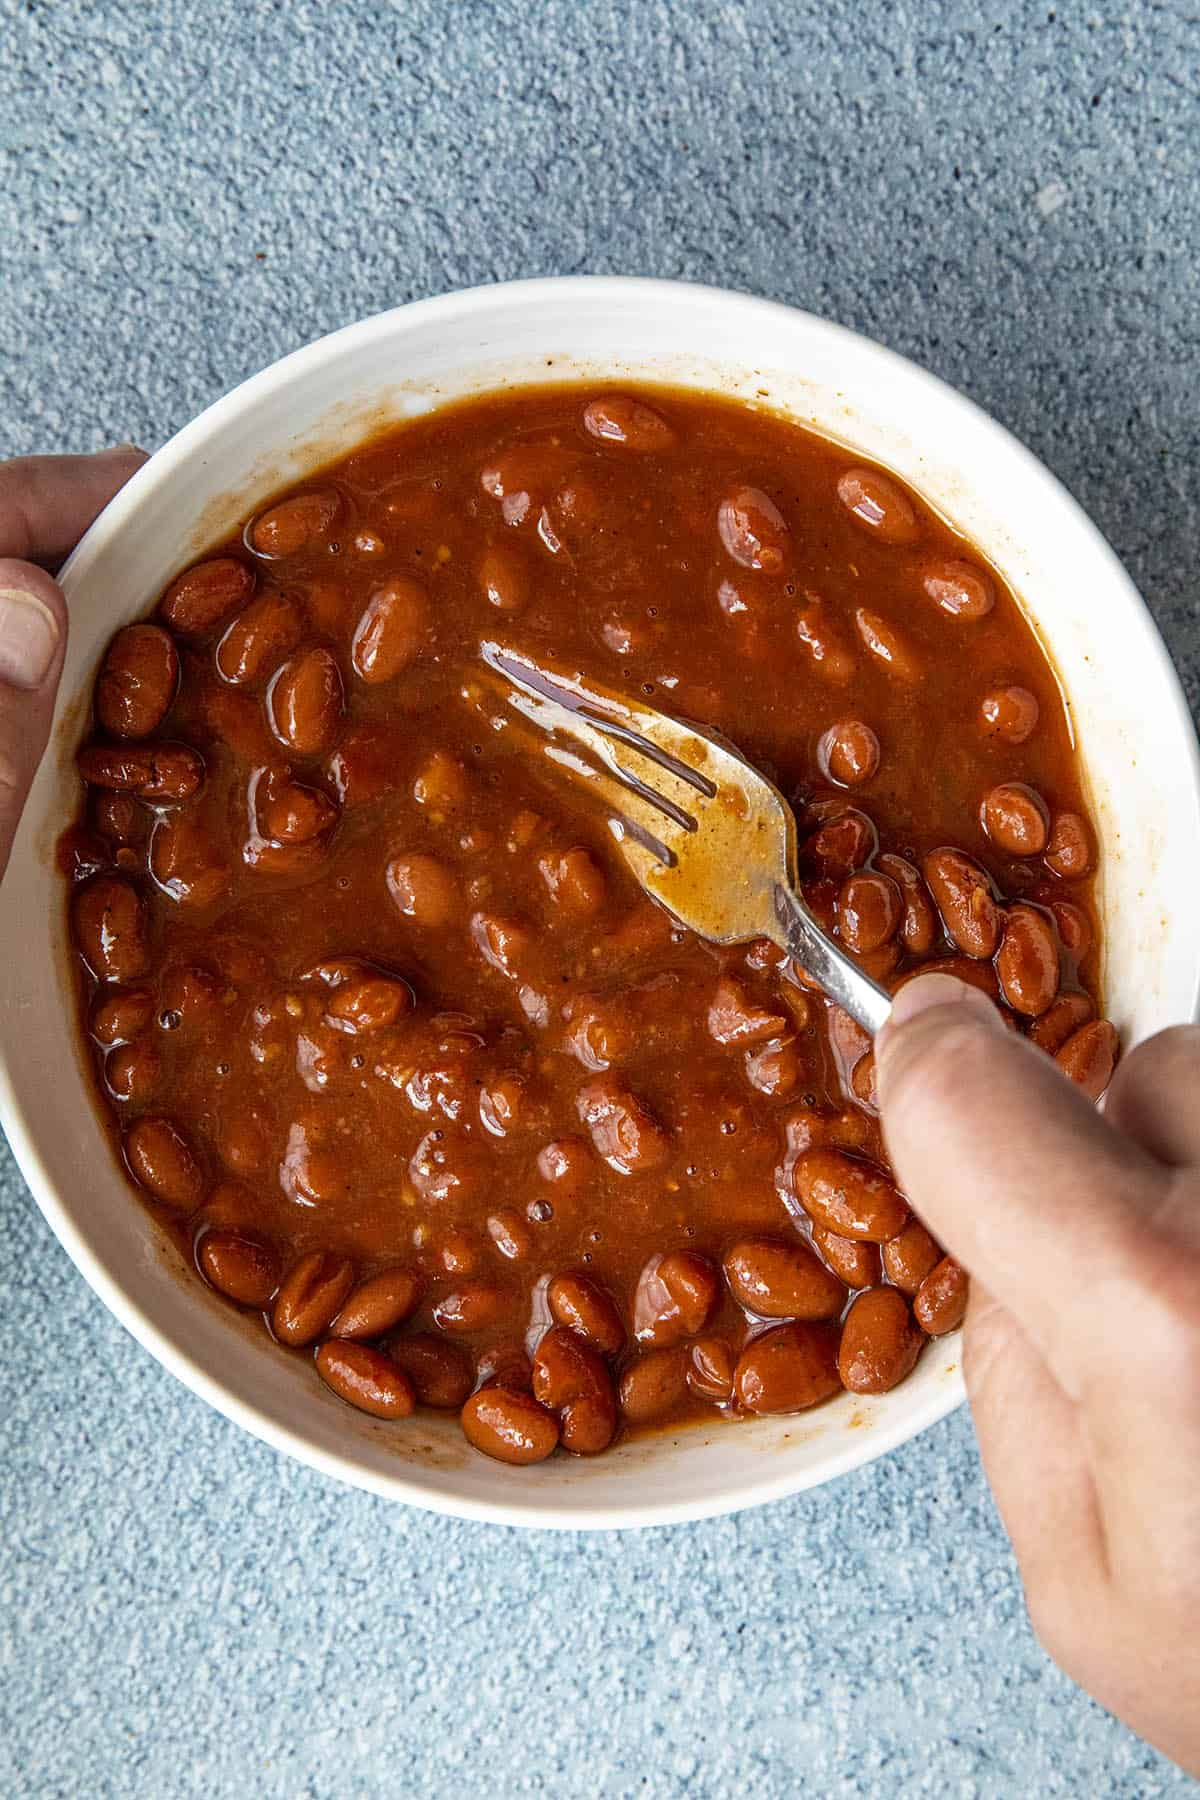 Mashing pinto beans to make a bean burrito